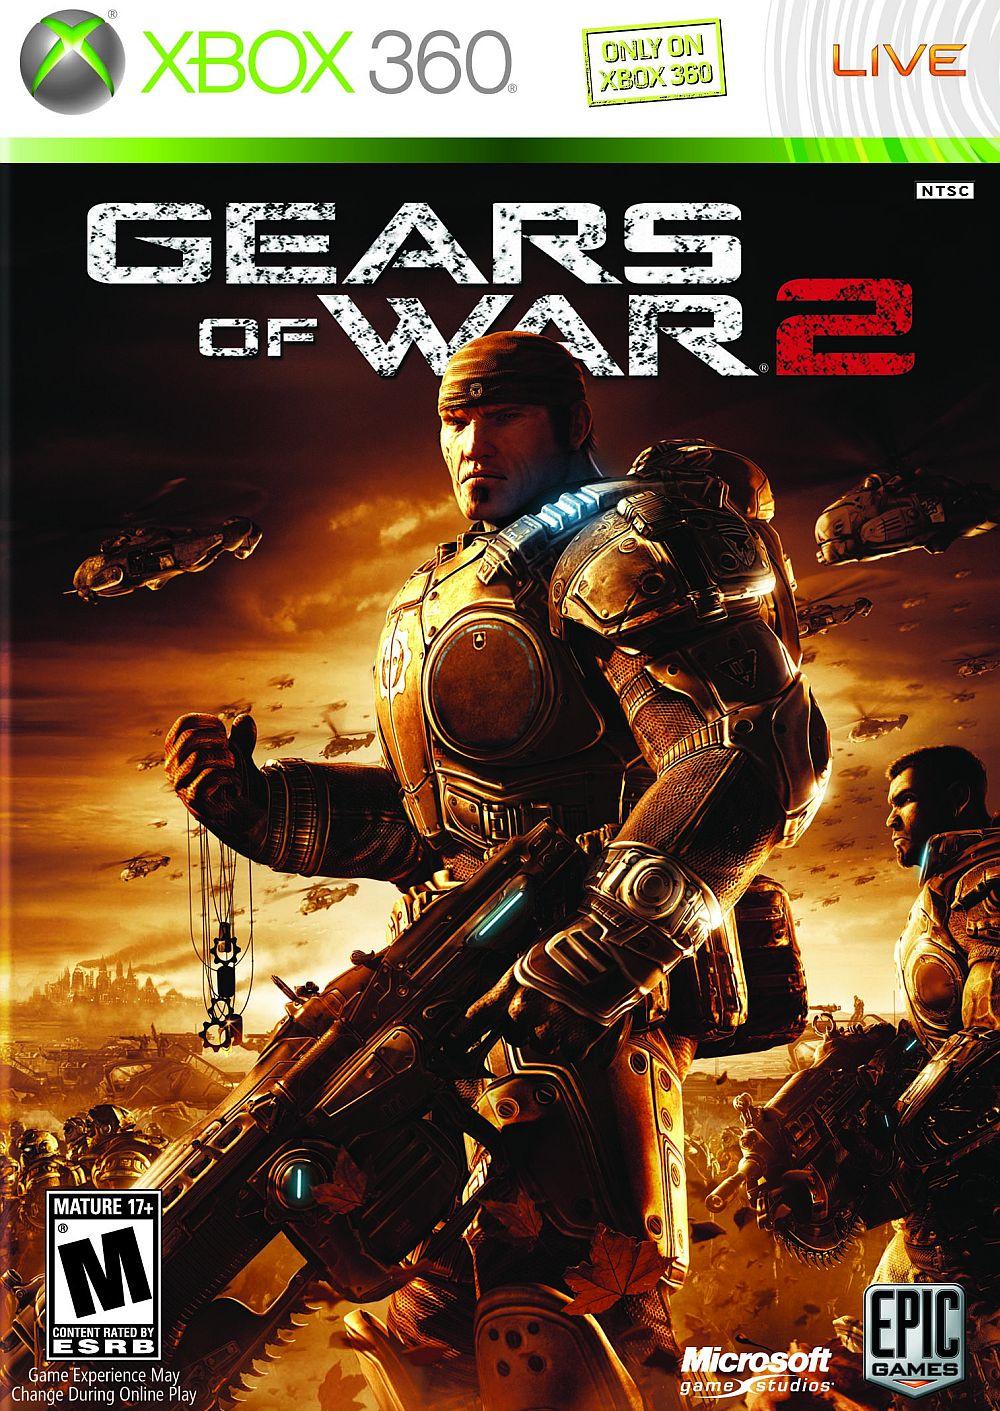 Xbox One / 360 - Gears of War Spiele bei Cdkeys ab 2,18€